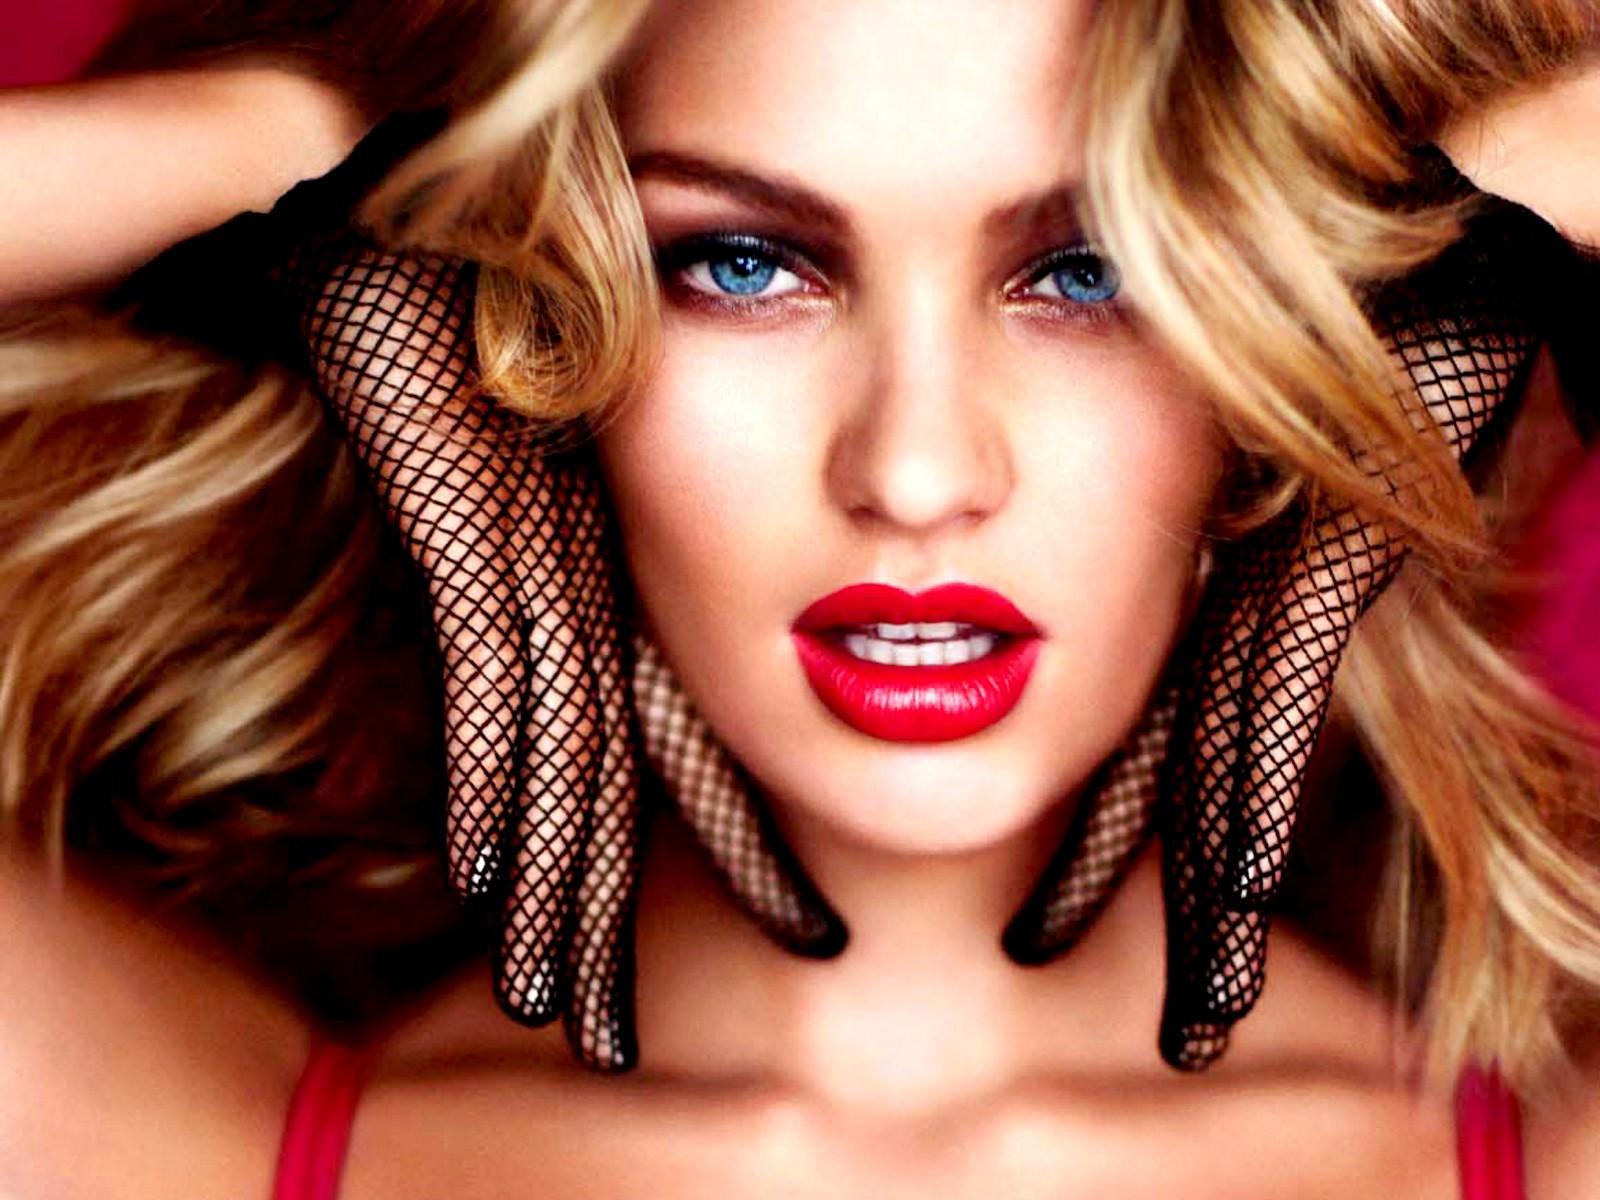 Red Lipstick Brown Hair Blue Eyes: Wallpaper : Face, Women, Model, Blonde, Long Hair, Blue